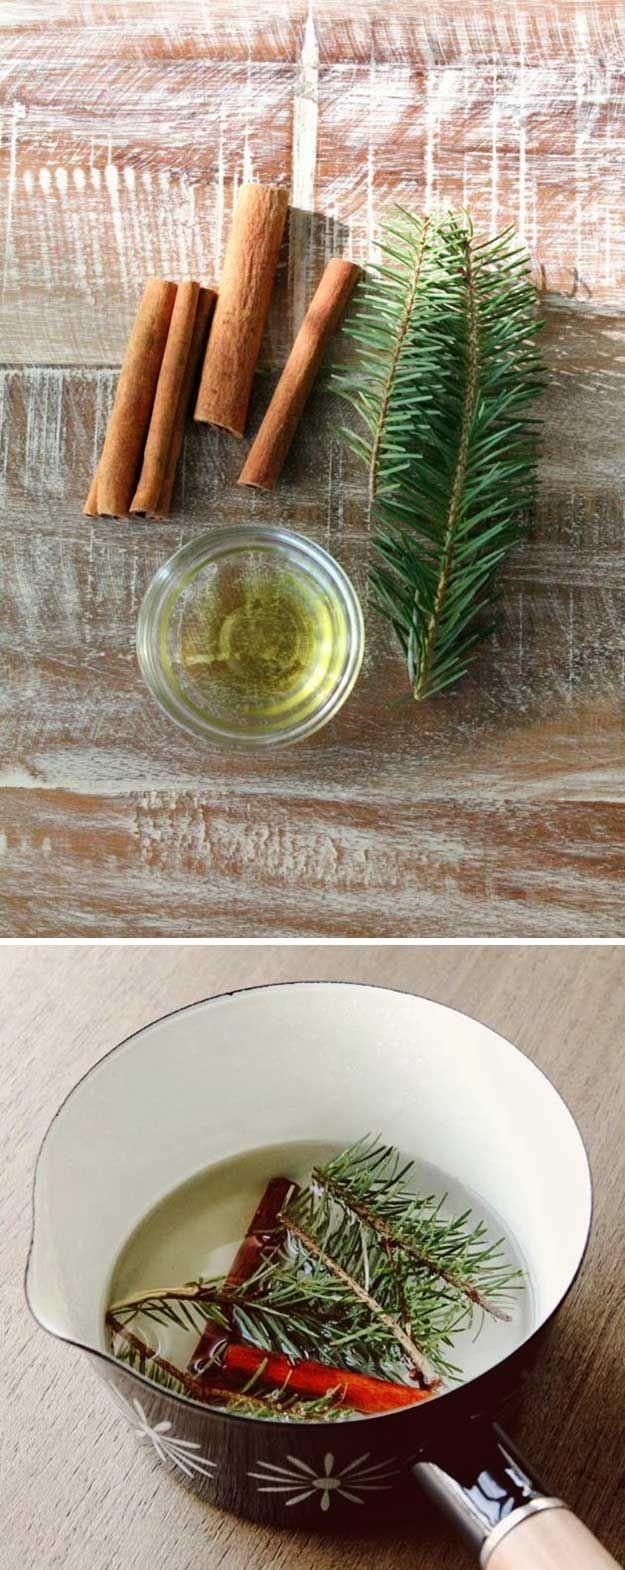 17 best ideas about homemade potpourri on pinterest stove top potpourri neighbor christmas. Black Bedroom Furniture Sets. Home Design Ideas